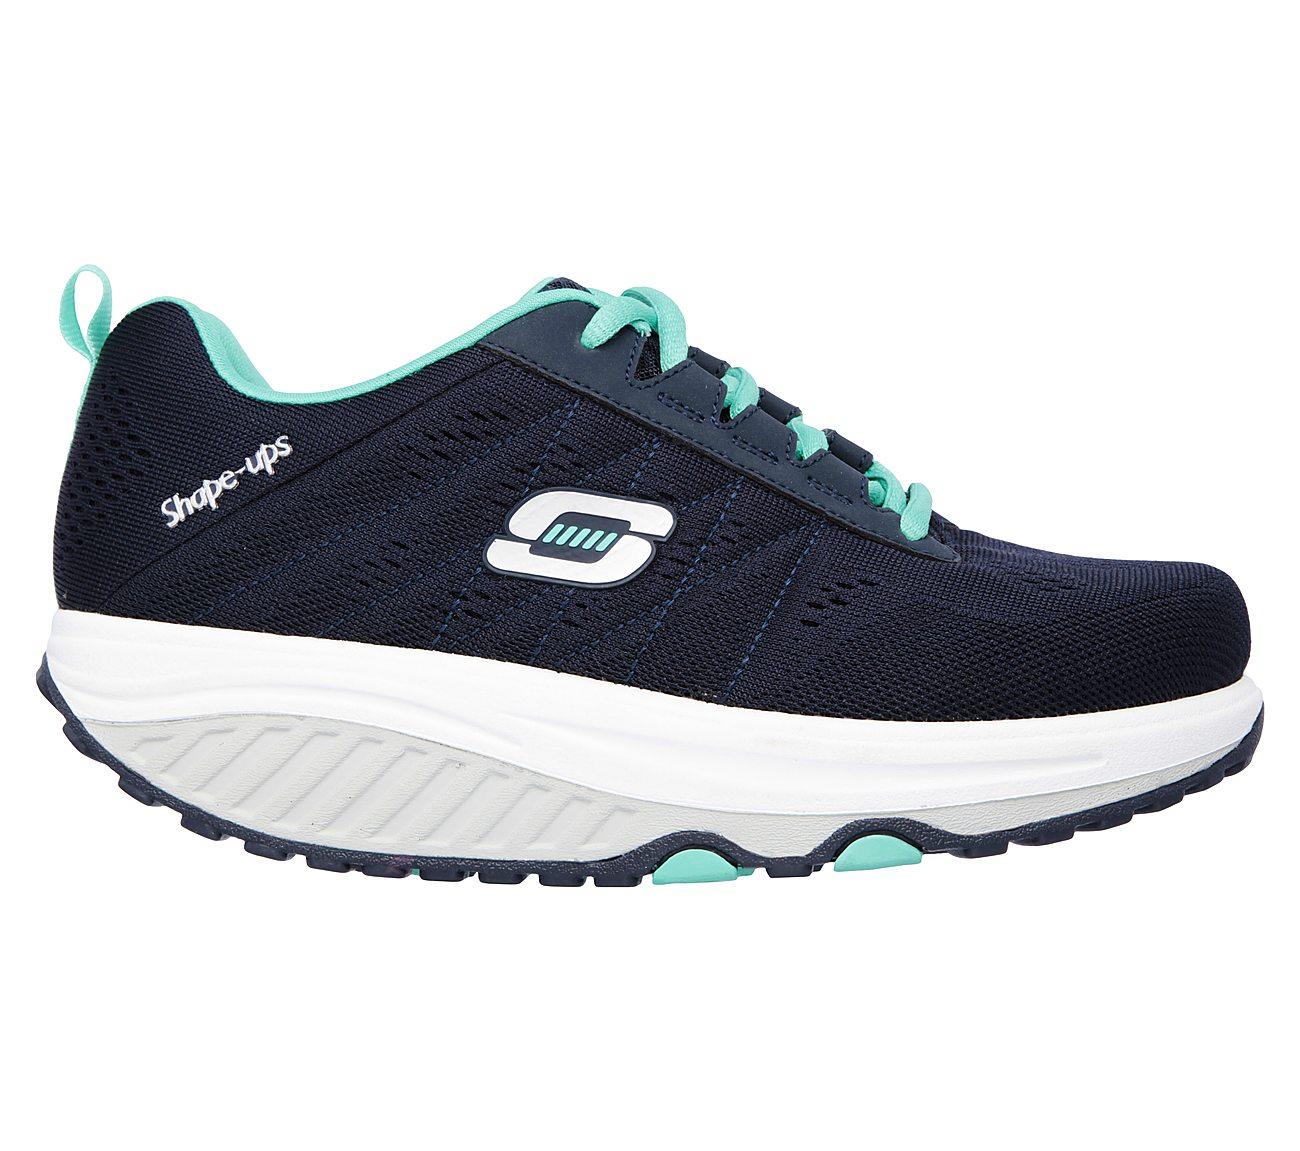 80f158f6bfc4 Buy SKECHERS Shape-ups 2.0 Shape-ups Shoes only  100.00